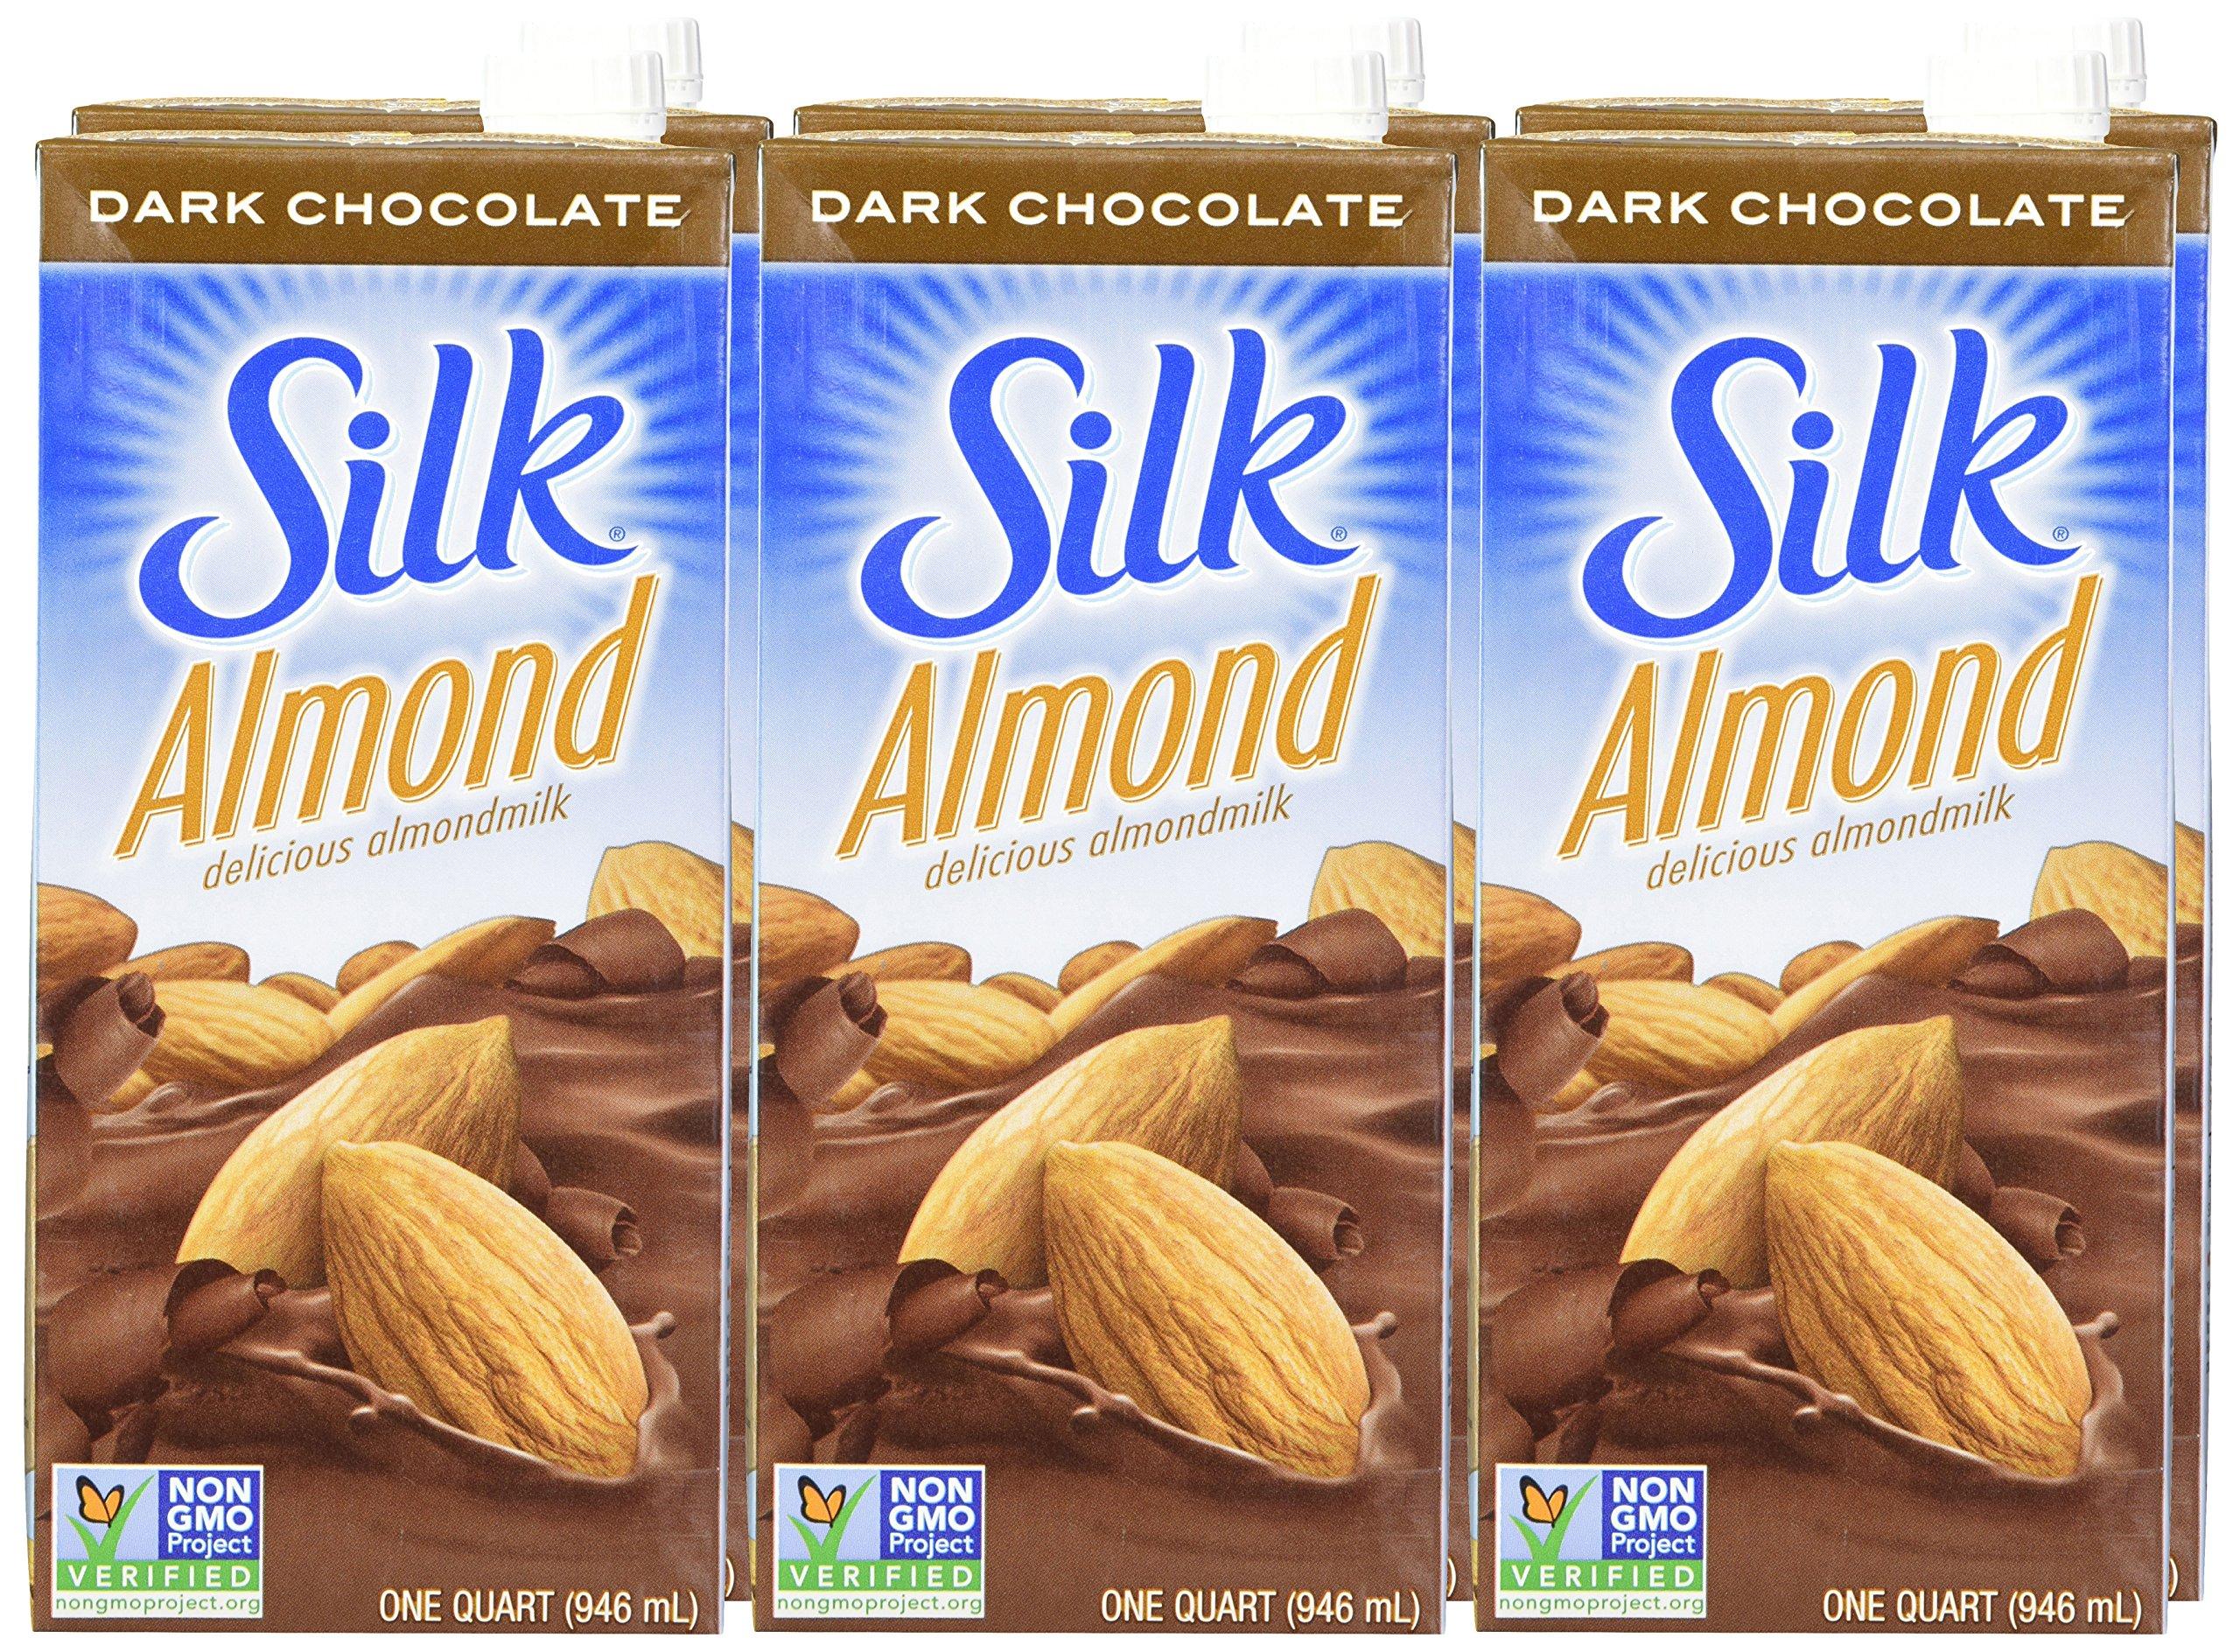 Silk Almond Milk Dark Chocolate 32 oz (Pack of 6) Shelf Stable, Dark Chocolate Flavored Non-Dairy Almond Milk, Individually Packaged by Silk (Image #2)